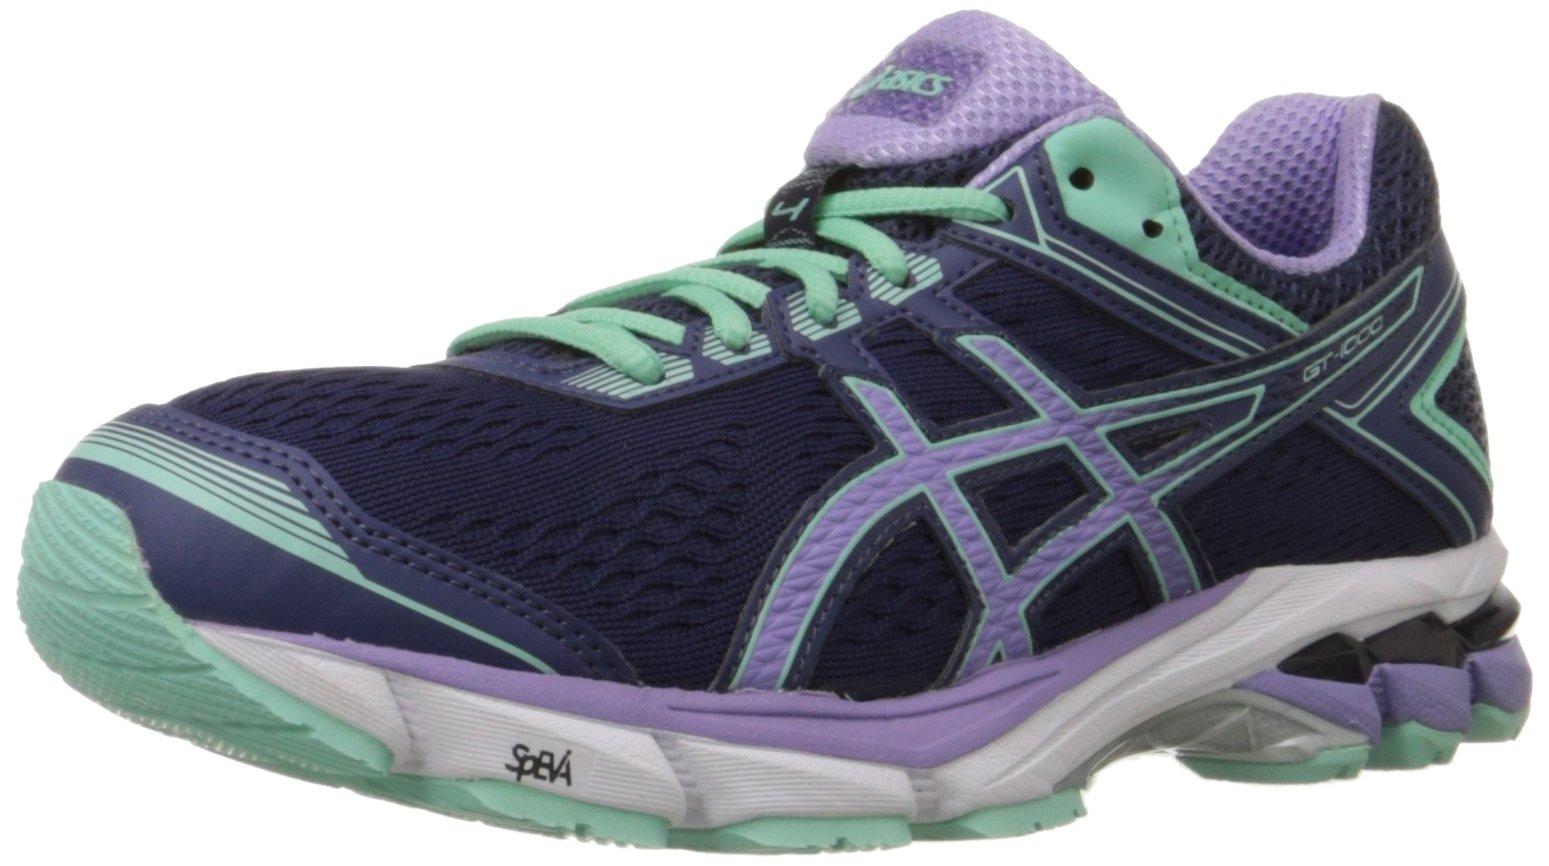 ASICS Women's Gt-1000 4 Running Shoe, Midnight/Violet/Beach Glass, 7 M US